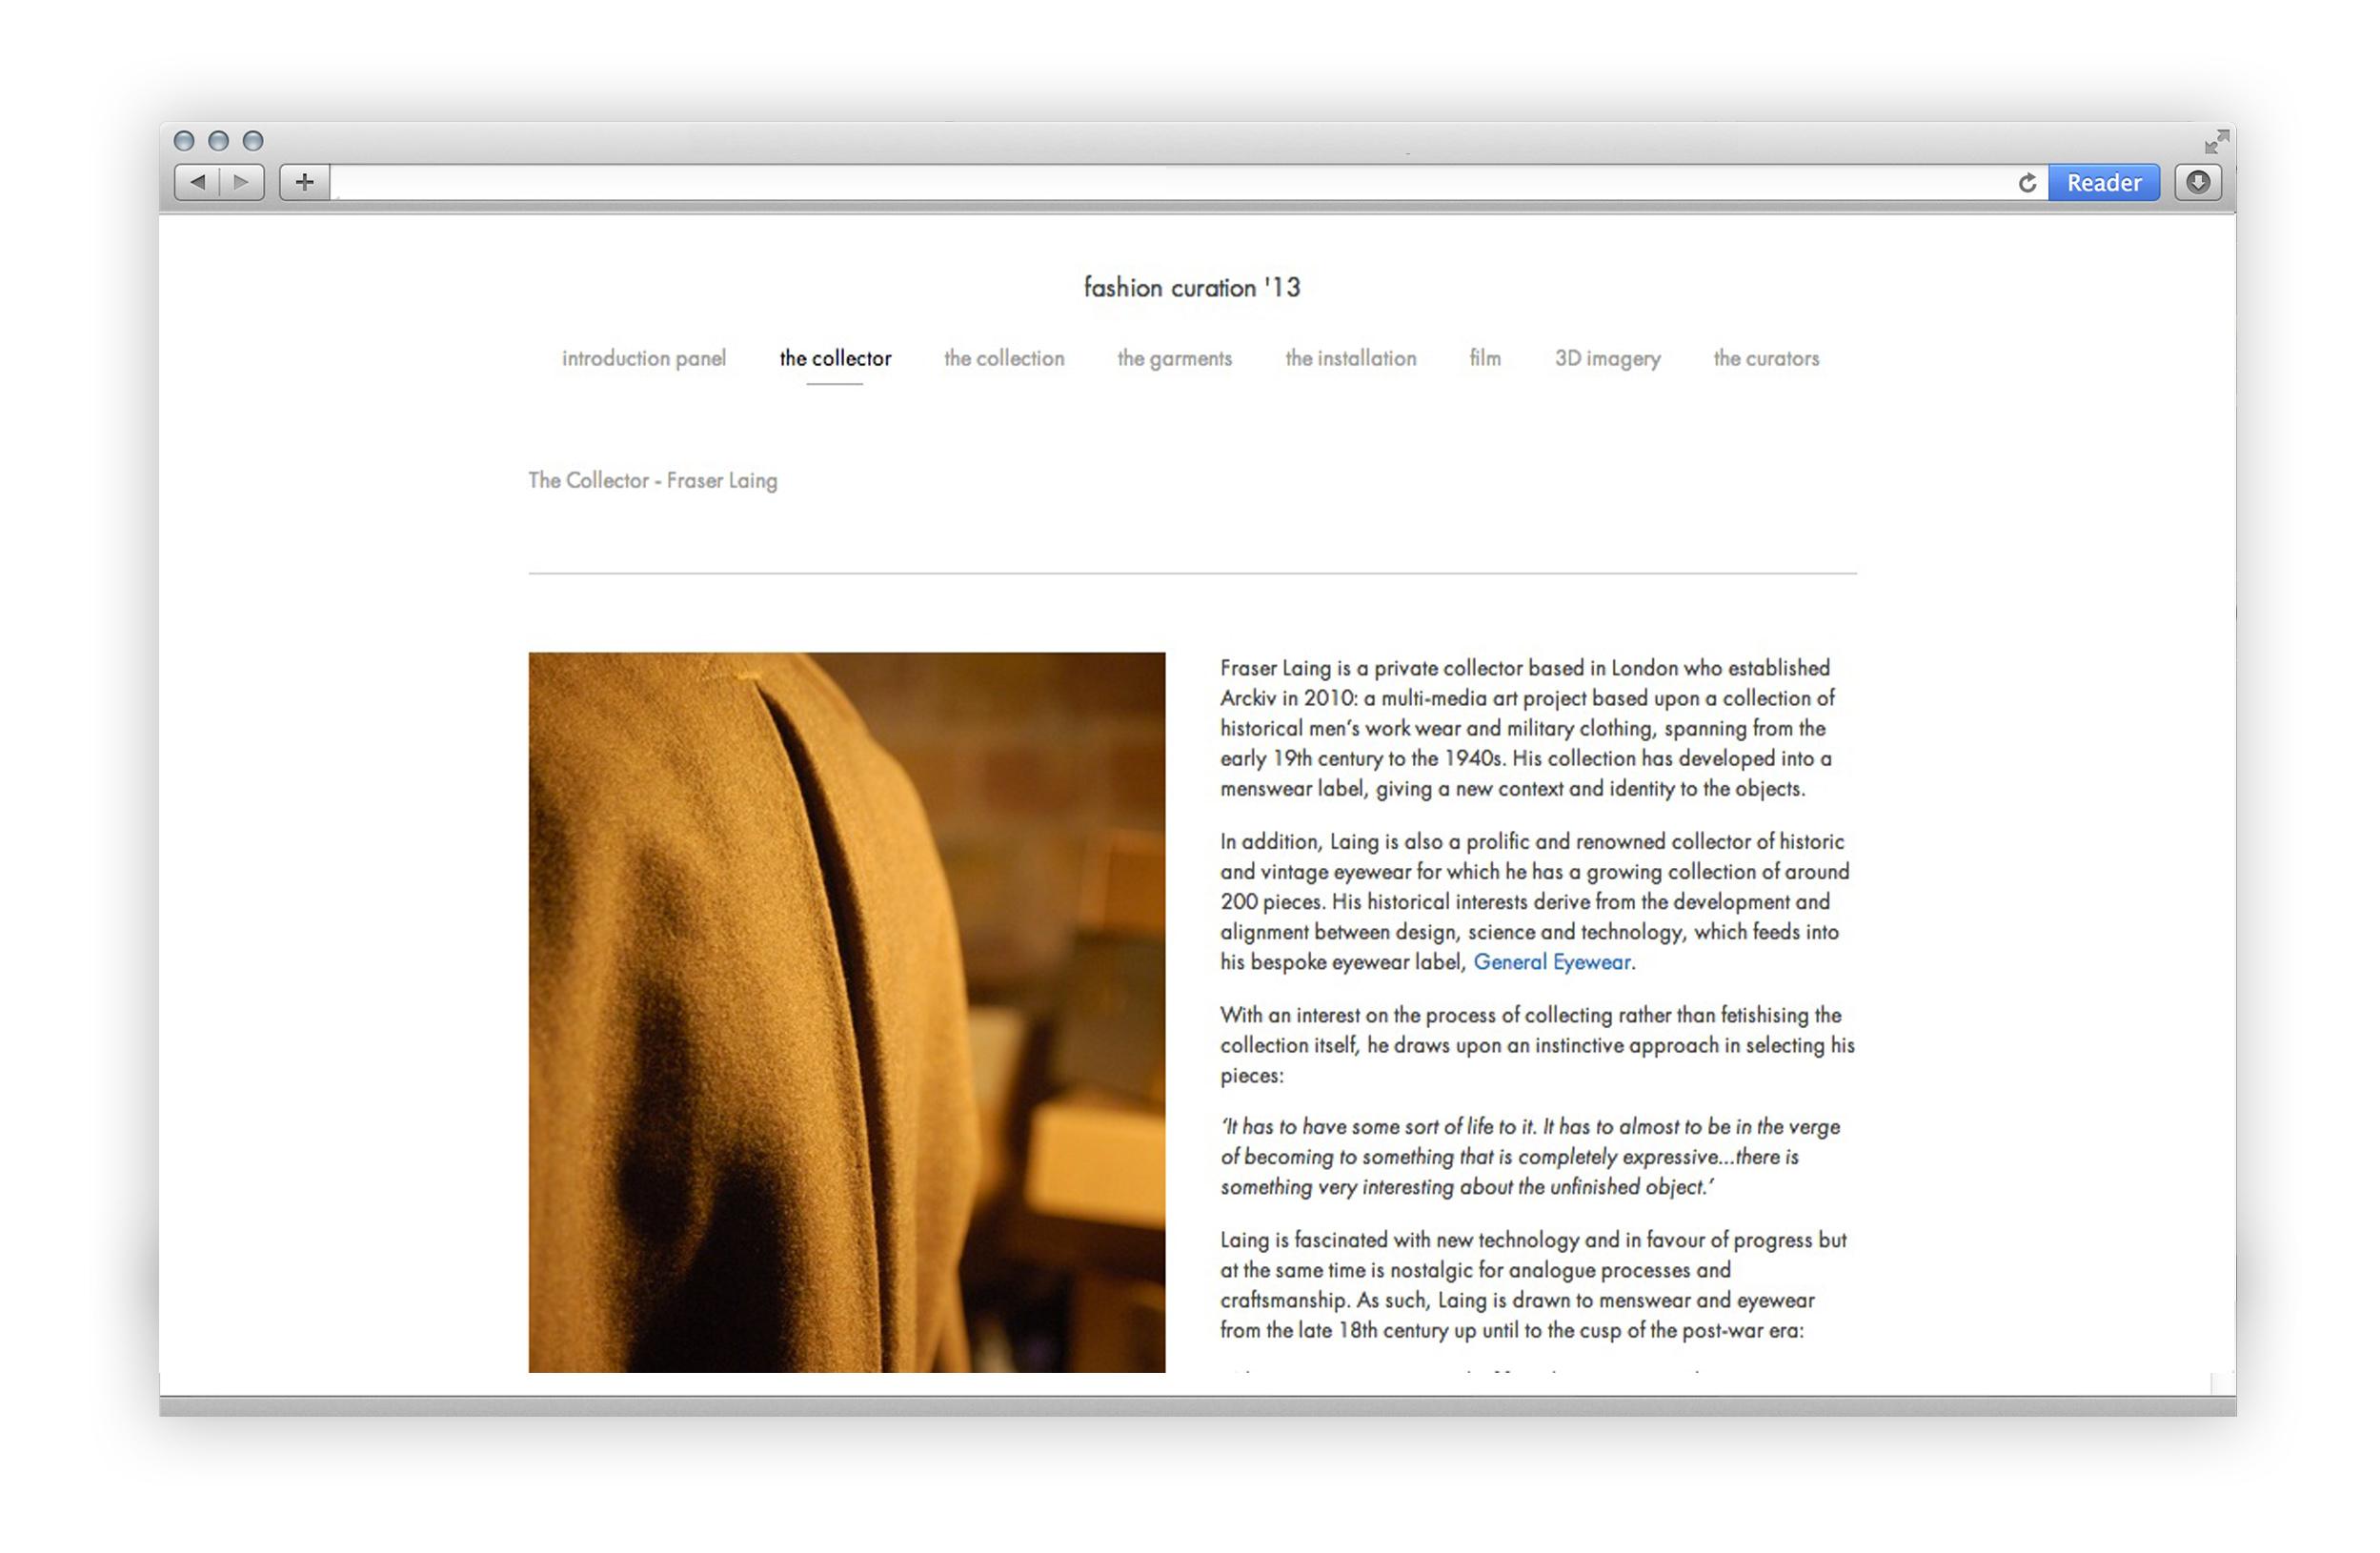 FASHION CURATION '13 - Website